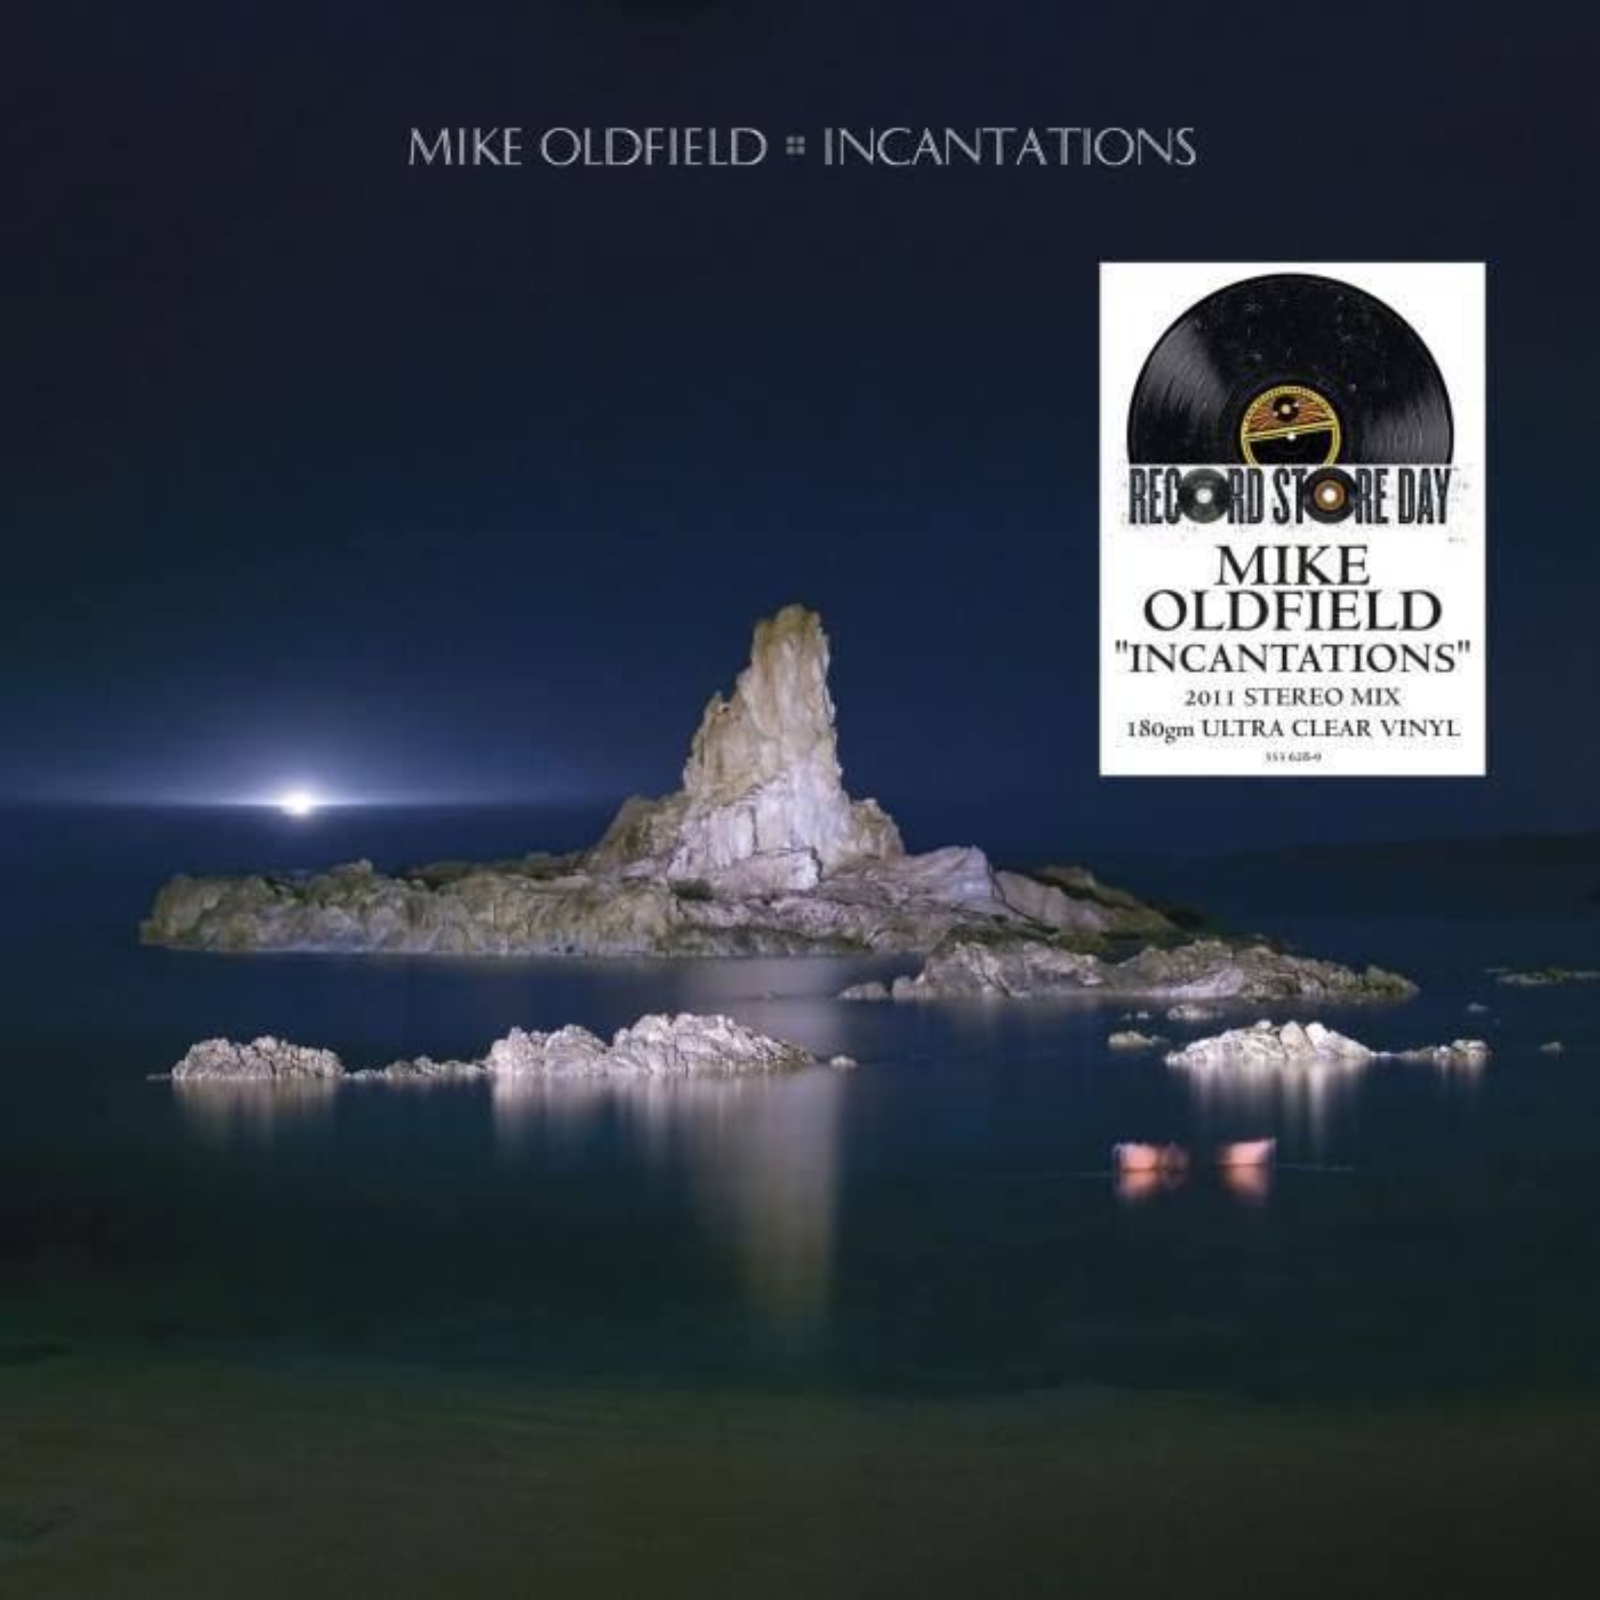 Виниловая пластинка Mike Oldfield - Incantations (Ultra Clear Vinyl)